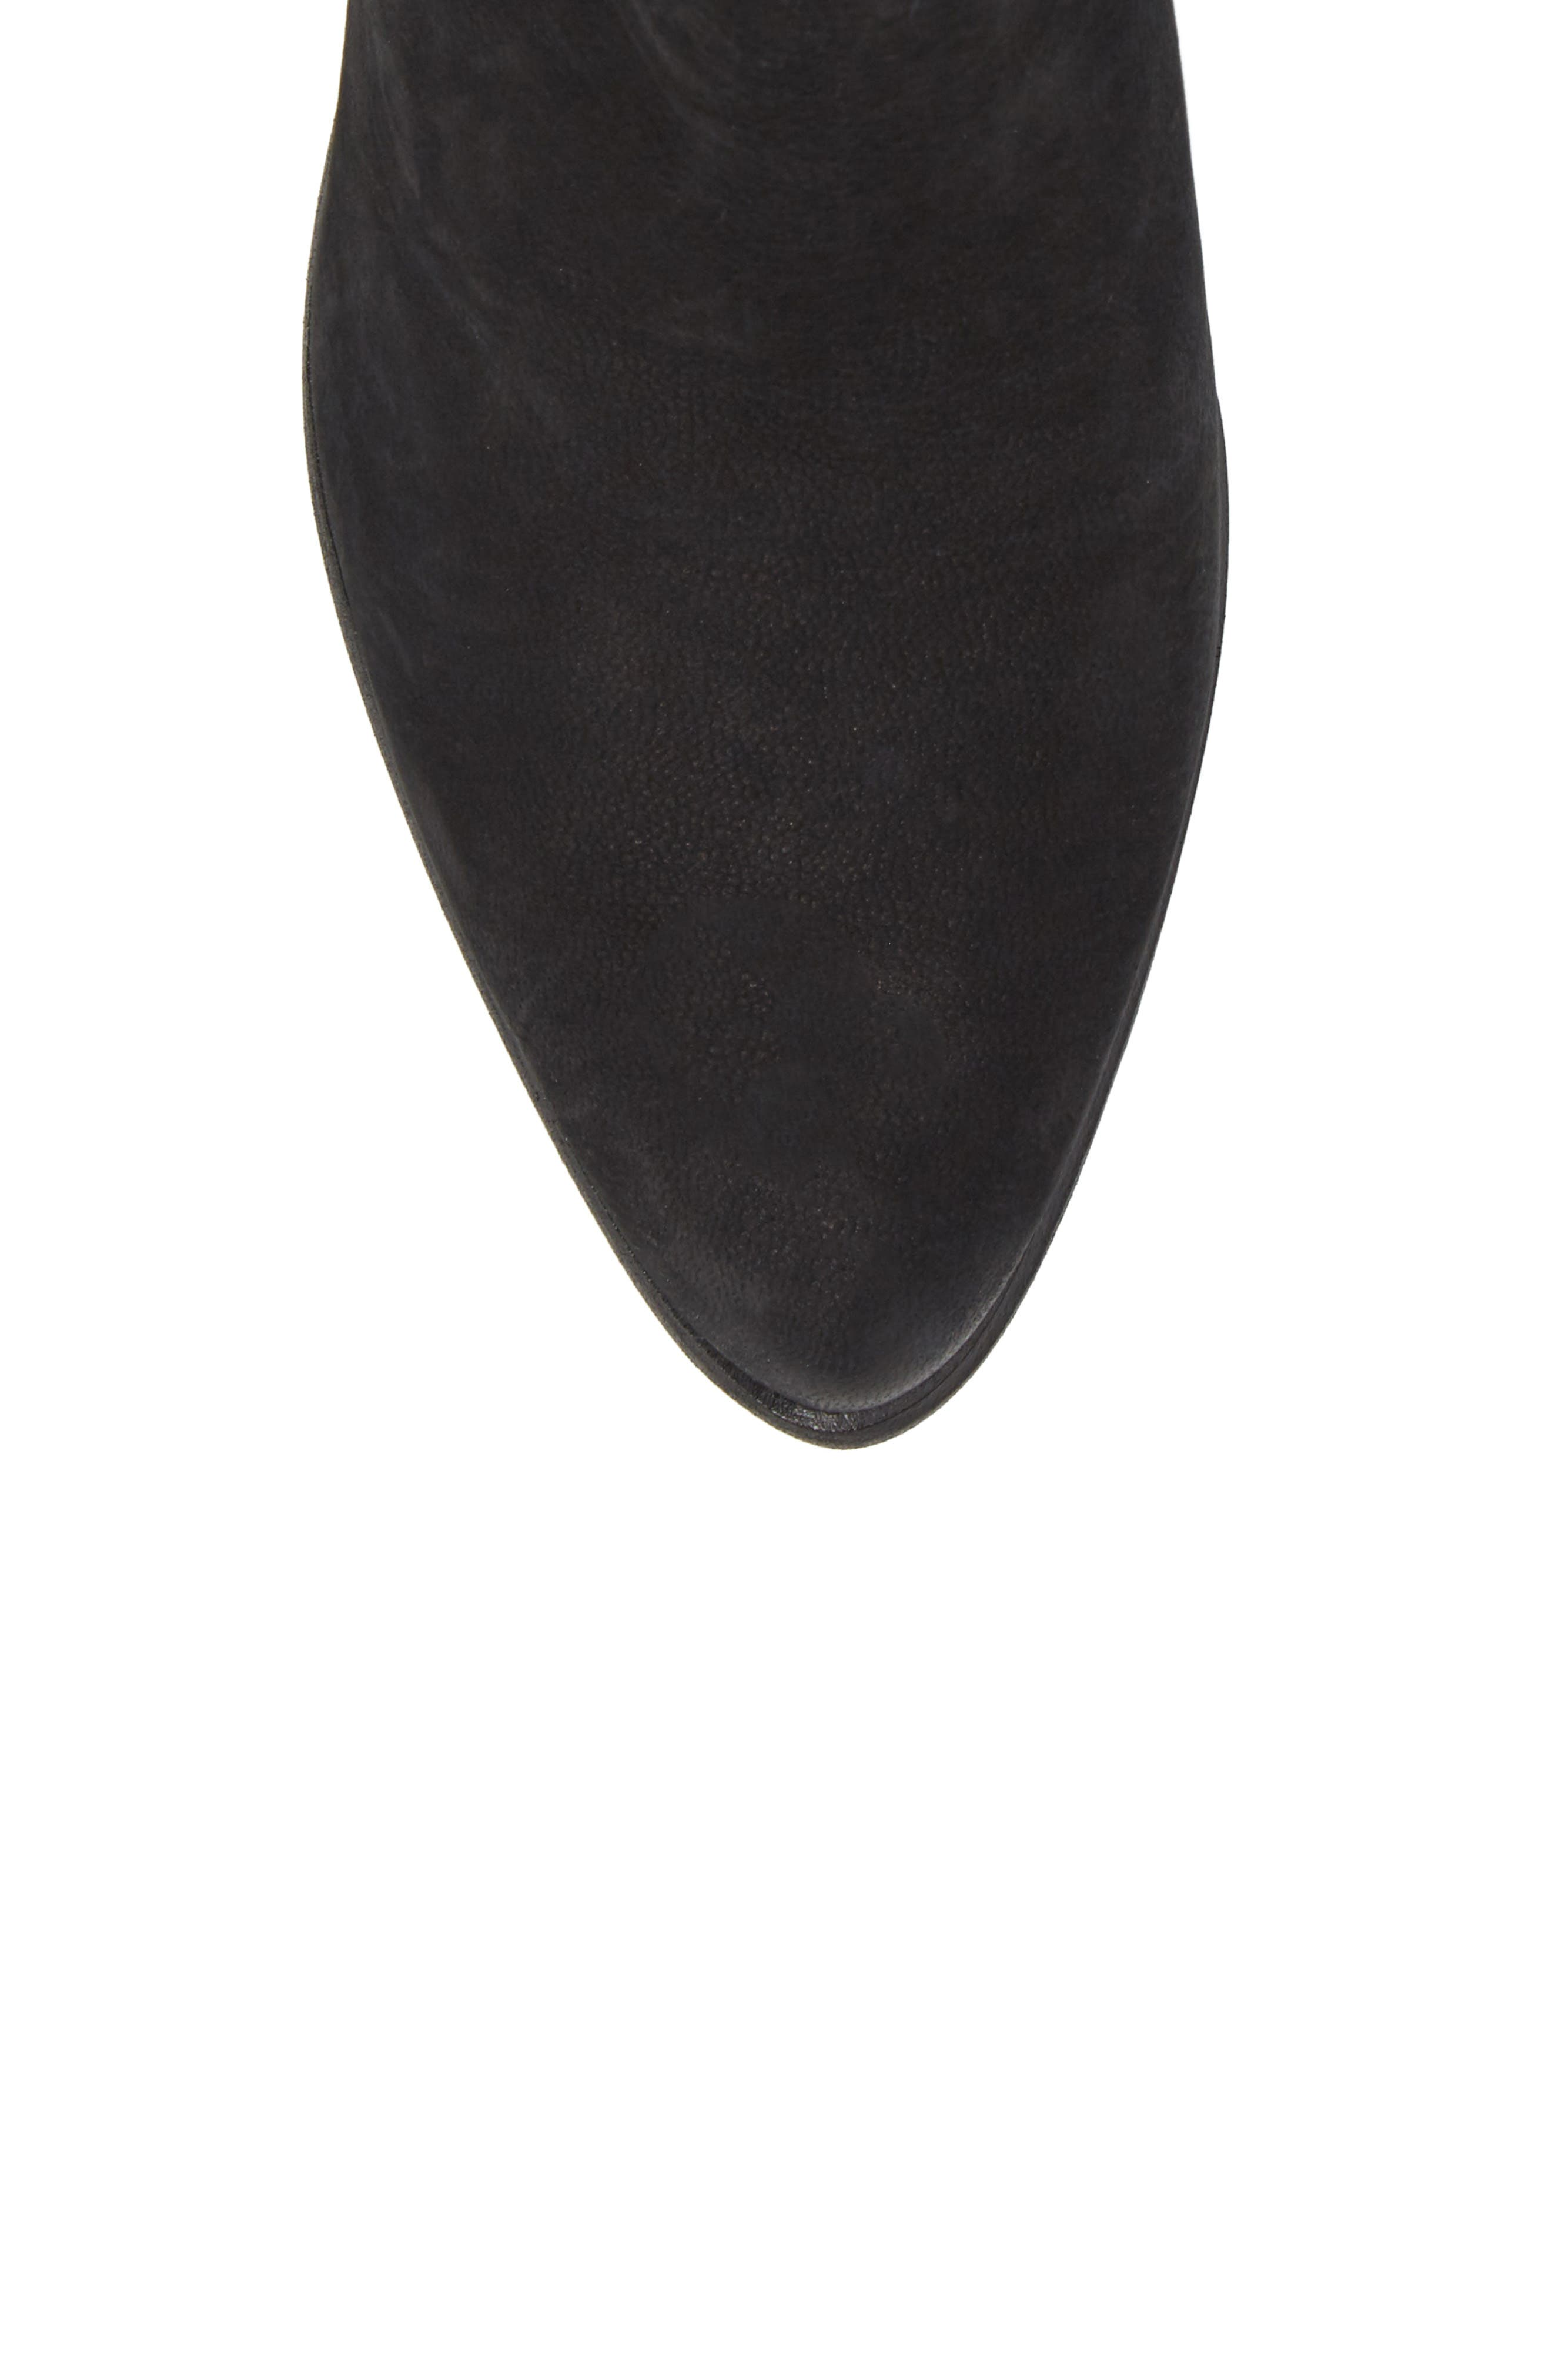 Cassius Block Heel Bootie,                             Alternate thumbnail 5, color,                             Black Nubuck Leather